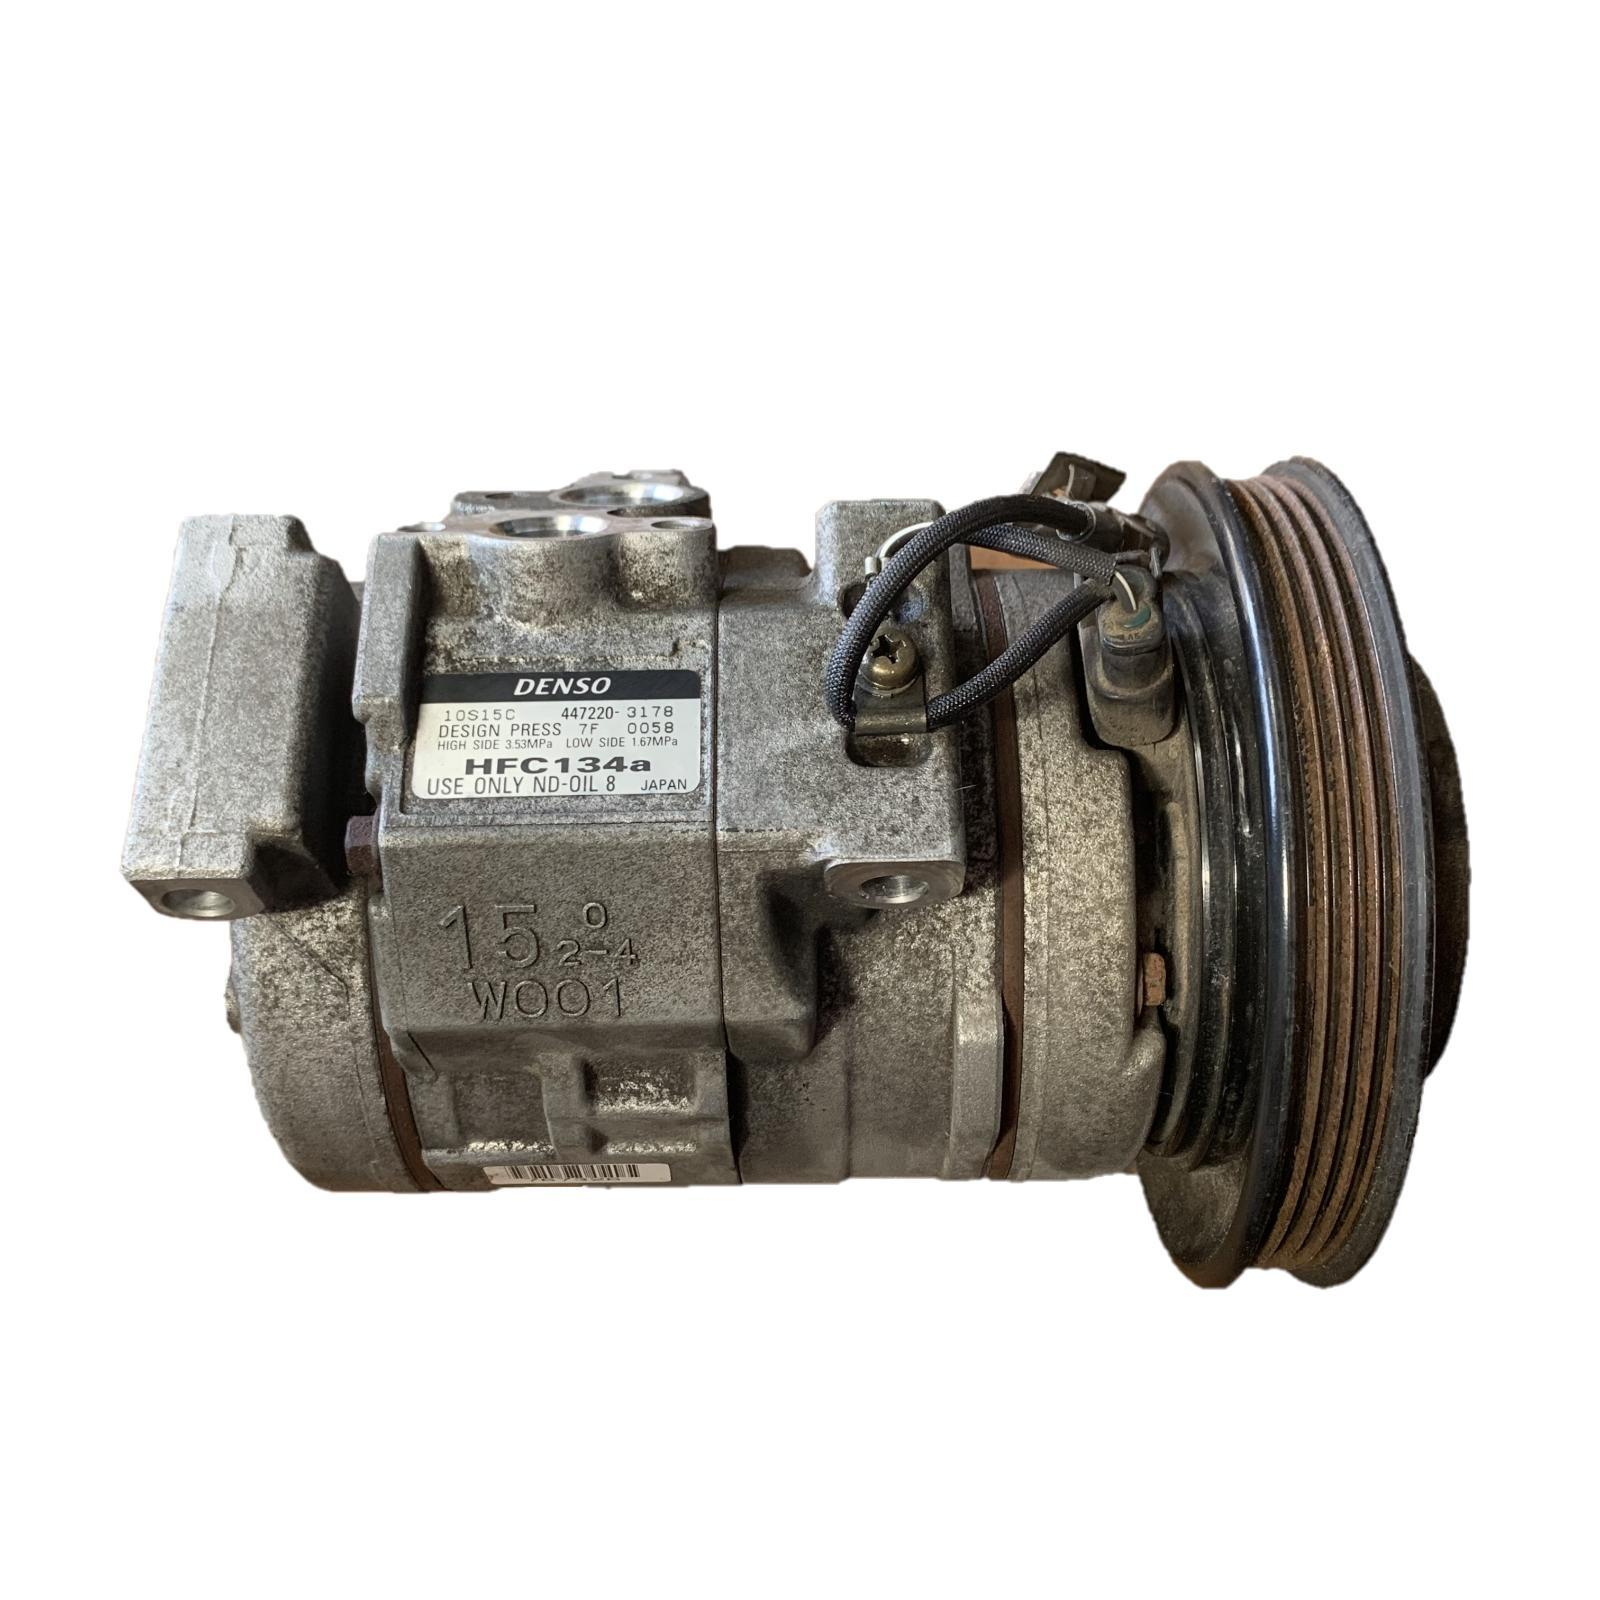 LEXUS IS200/IS300, A/C Compressor, IS200, 2.0, 1G-FE, 01/98-10/05